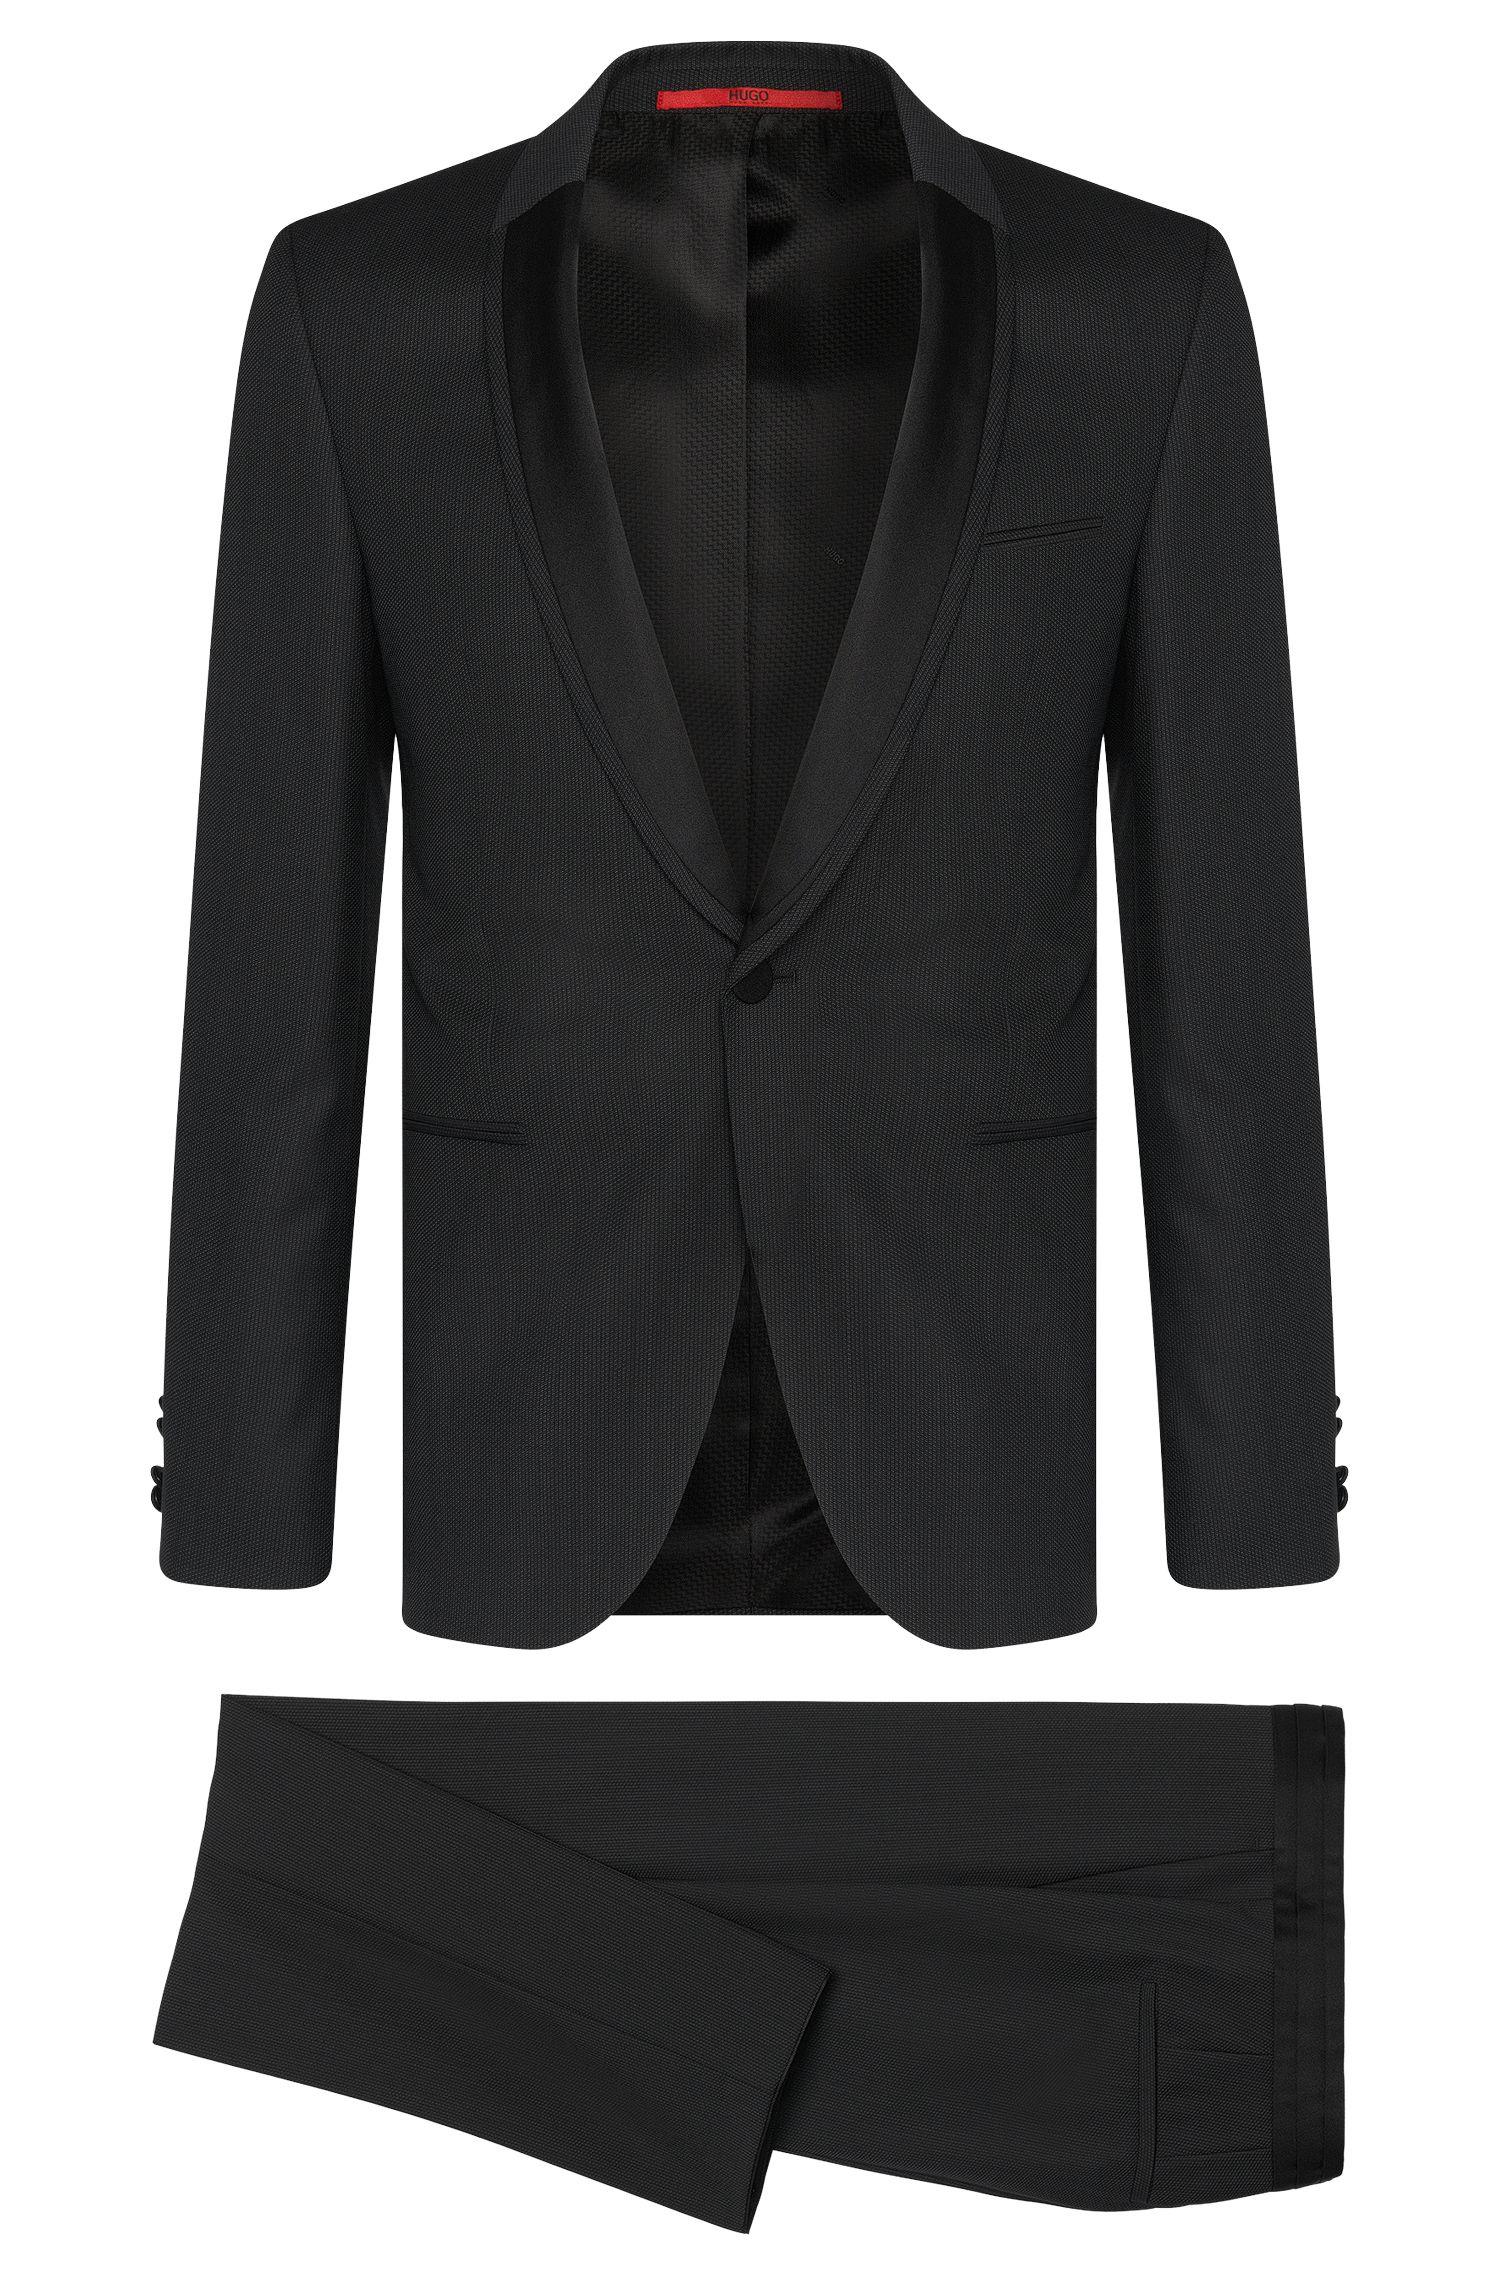 Super 110 Virgin Wool Tuxedo, Extra-Slim Fit | Anros/Himans